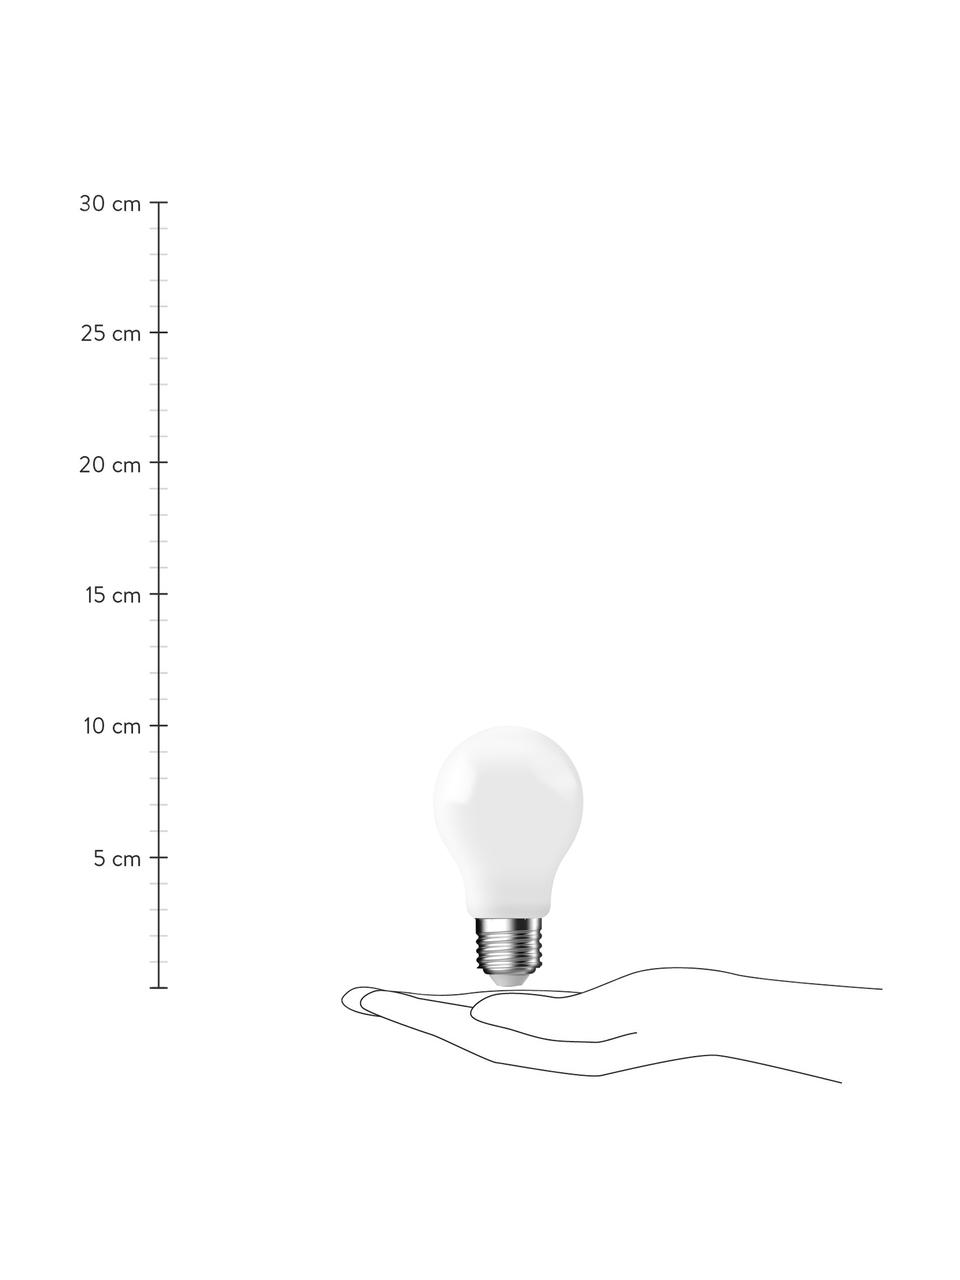 E27 Leuchtmittel, 8.6W, dimmbar, warmweiß, 3 Stück, Leuchtmittelschirm: Glas, Leuchtmittelfassung: Aluminium, Weiß, Ø 6 x H 10 cm